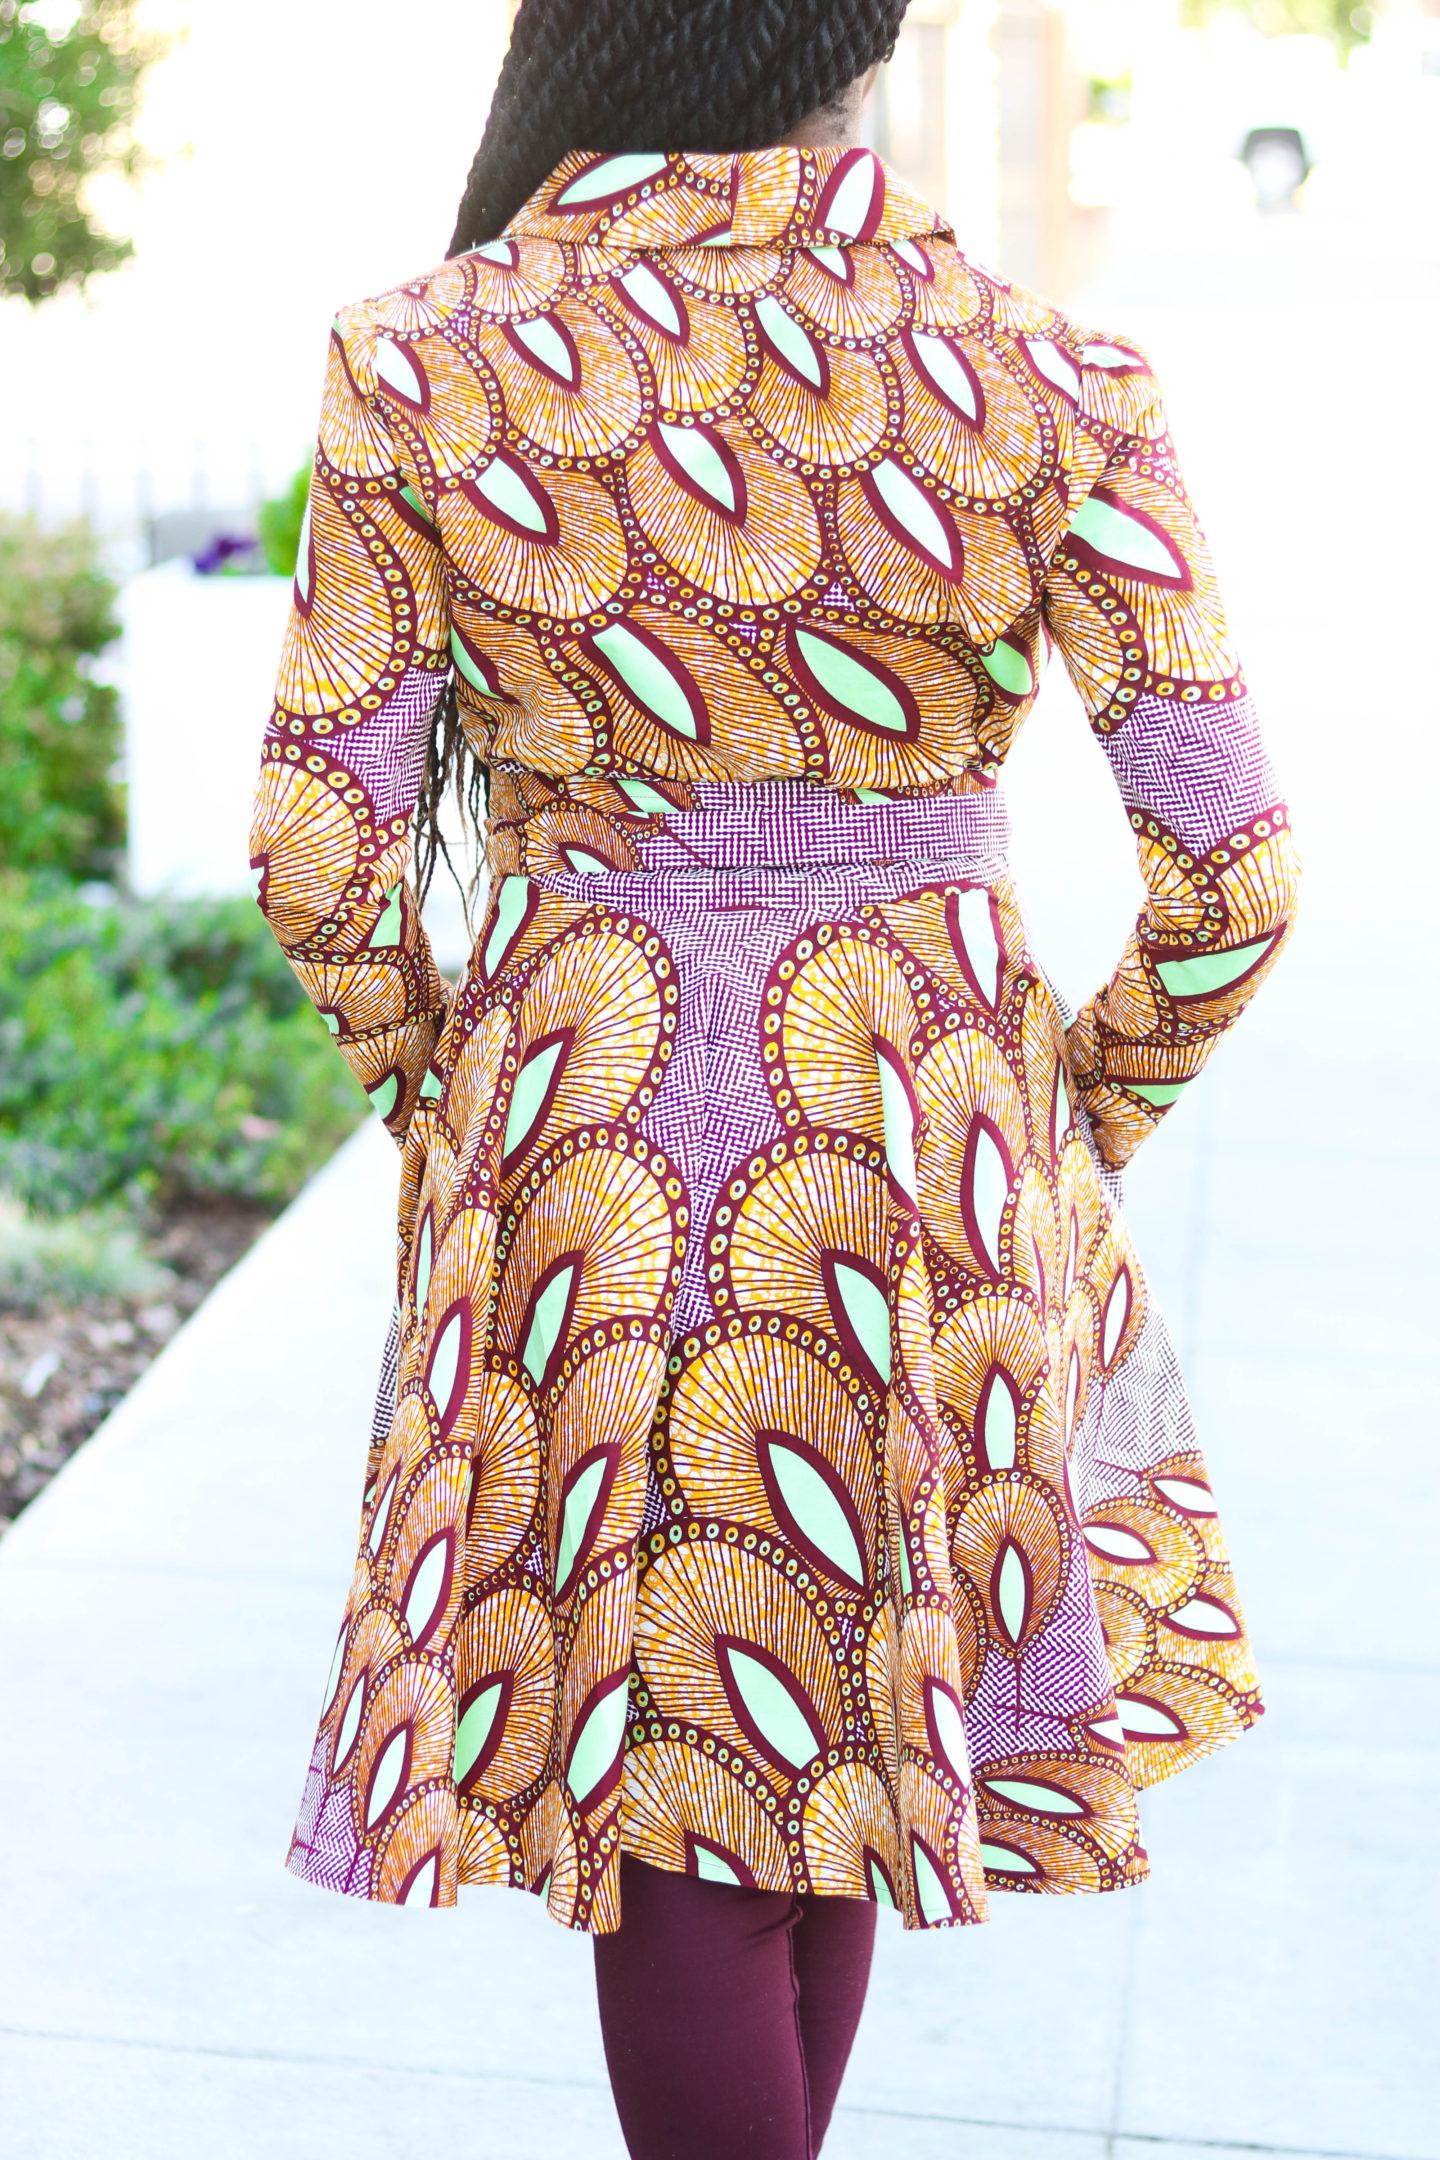 DIY African Ankara Print Coat Dress with Pockets Tutorial M6844, African Fashion, Kitenge, Nigerian Fashion, Ghanaian Fashion, Modern African Fashion, Beginners Sewing Tutorial